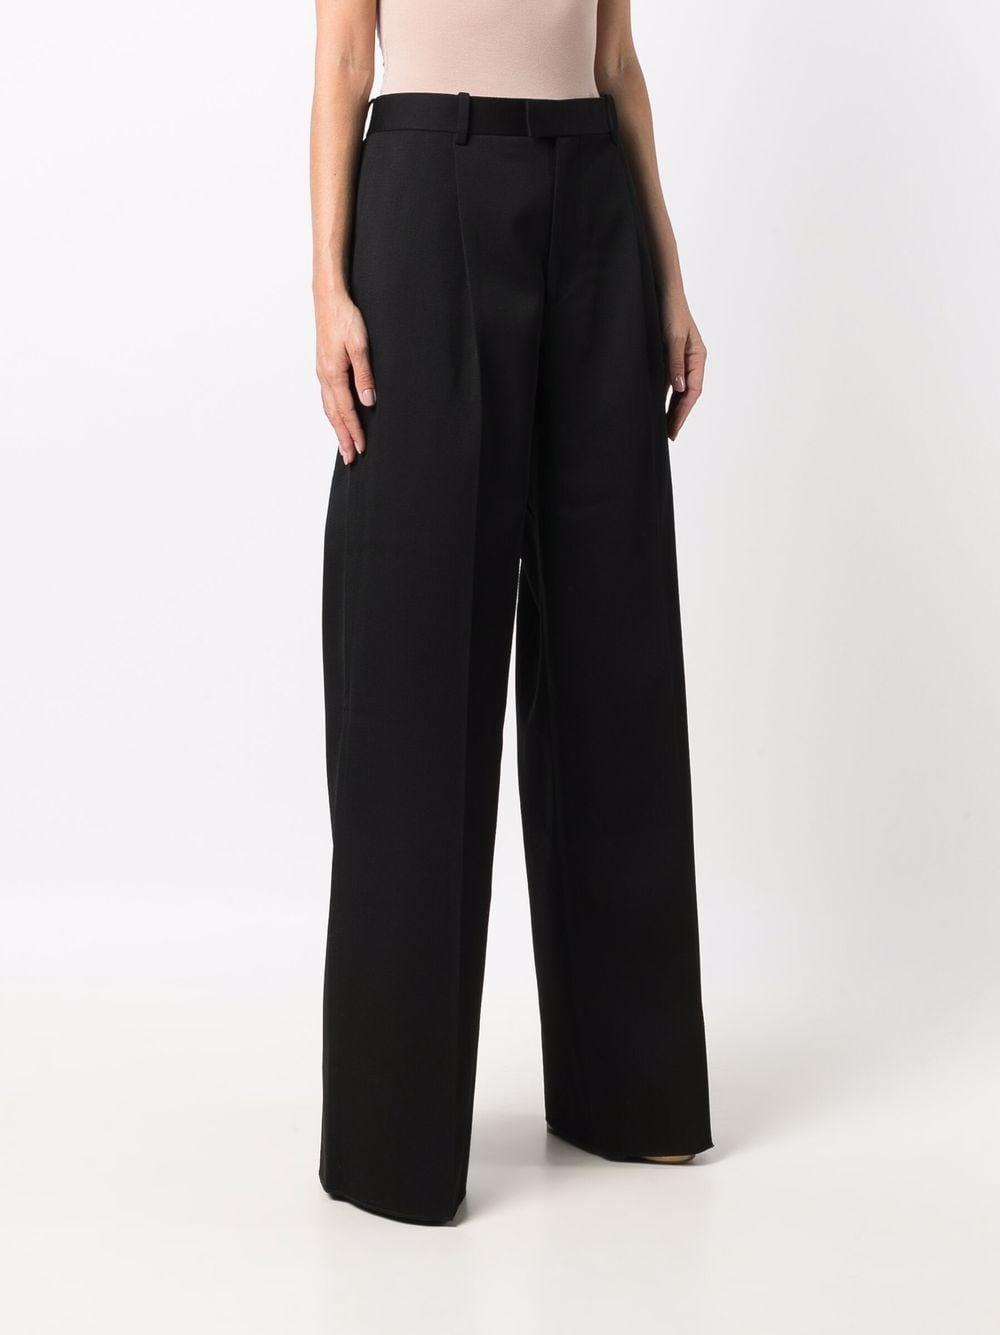 Pantaloni sartoriali a gamba larga in lana nera a vita alta BOTTEGA VENETA | Pantaloni | 668760-V0B201000